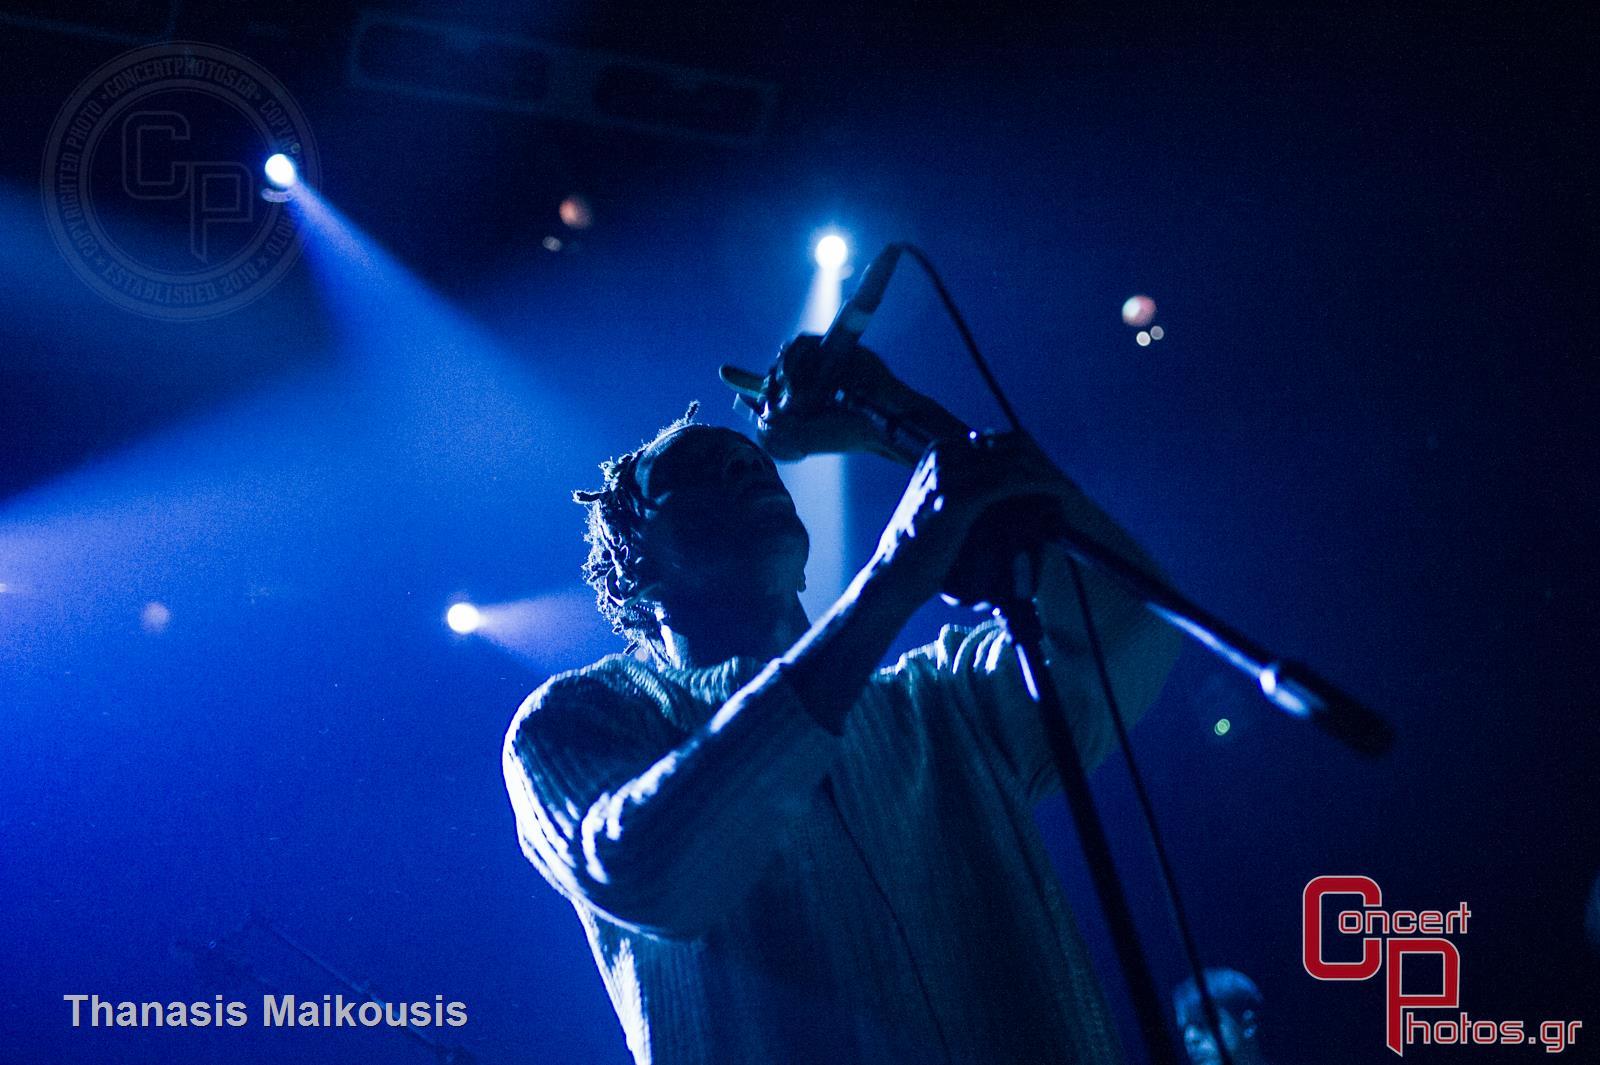 Tricky - Spectralfire-Tricky - Spectralfire photographer: Thanasis Maikousis - concertphotos_-3688